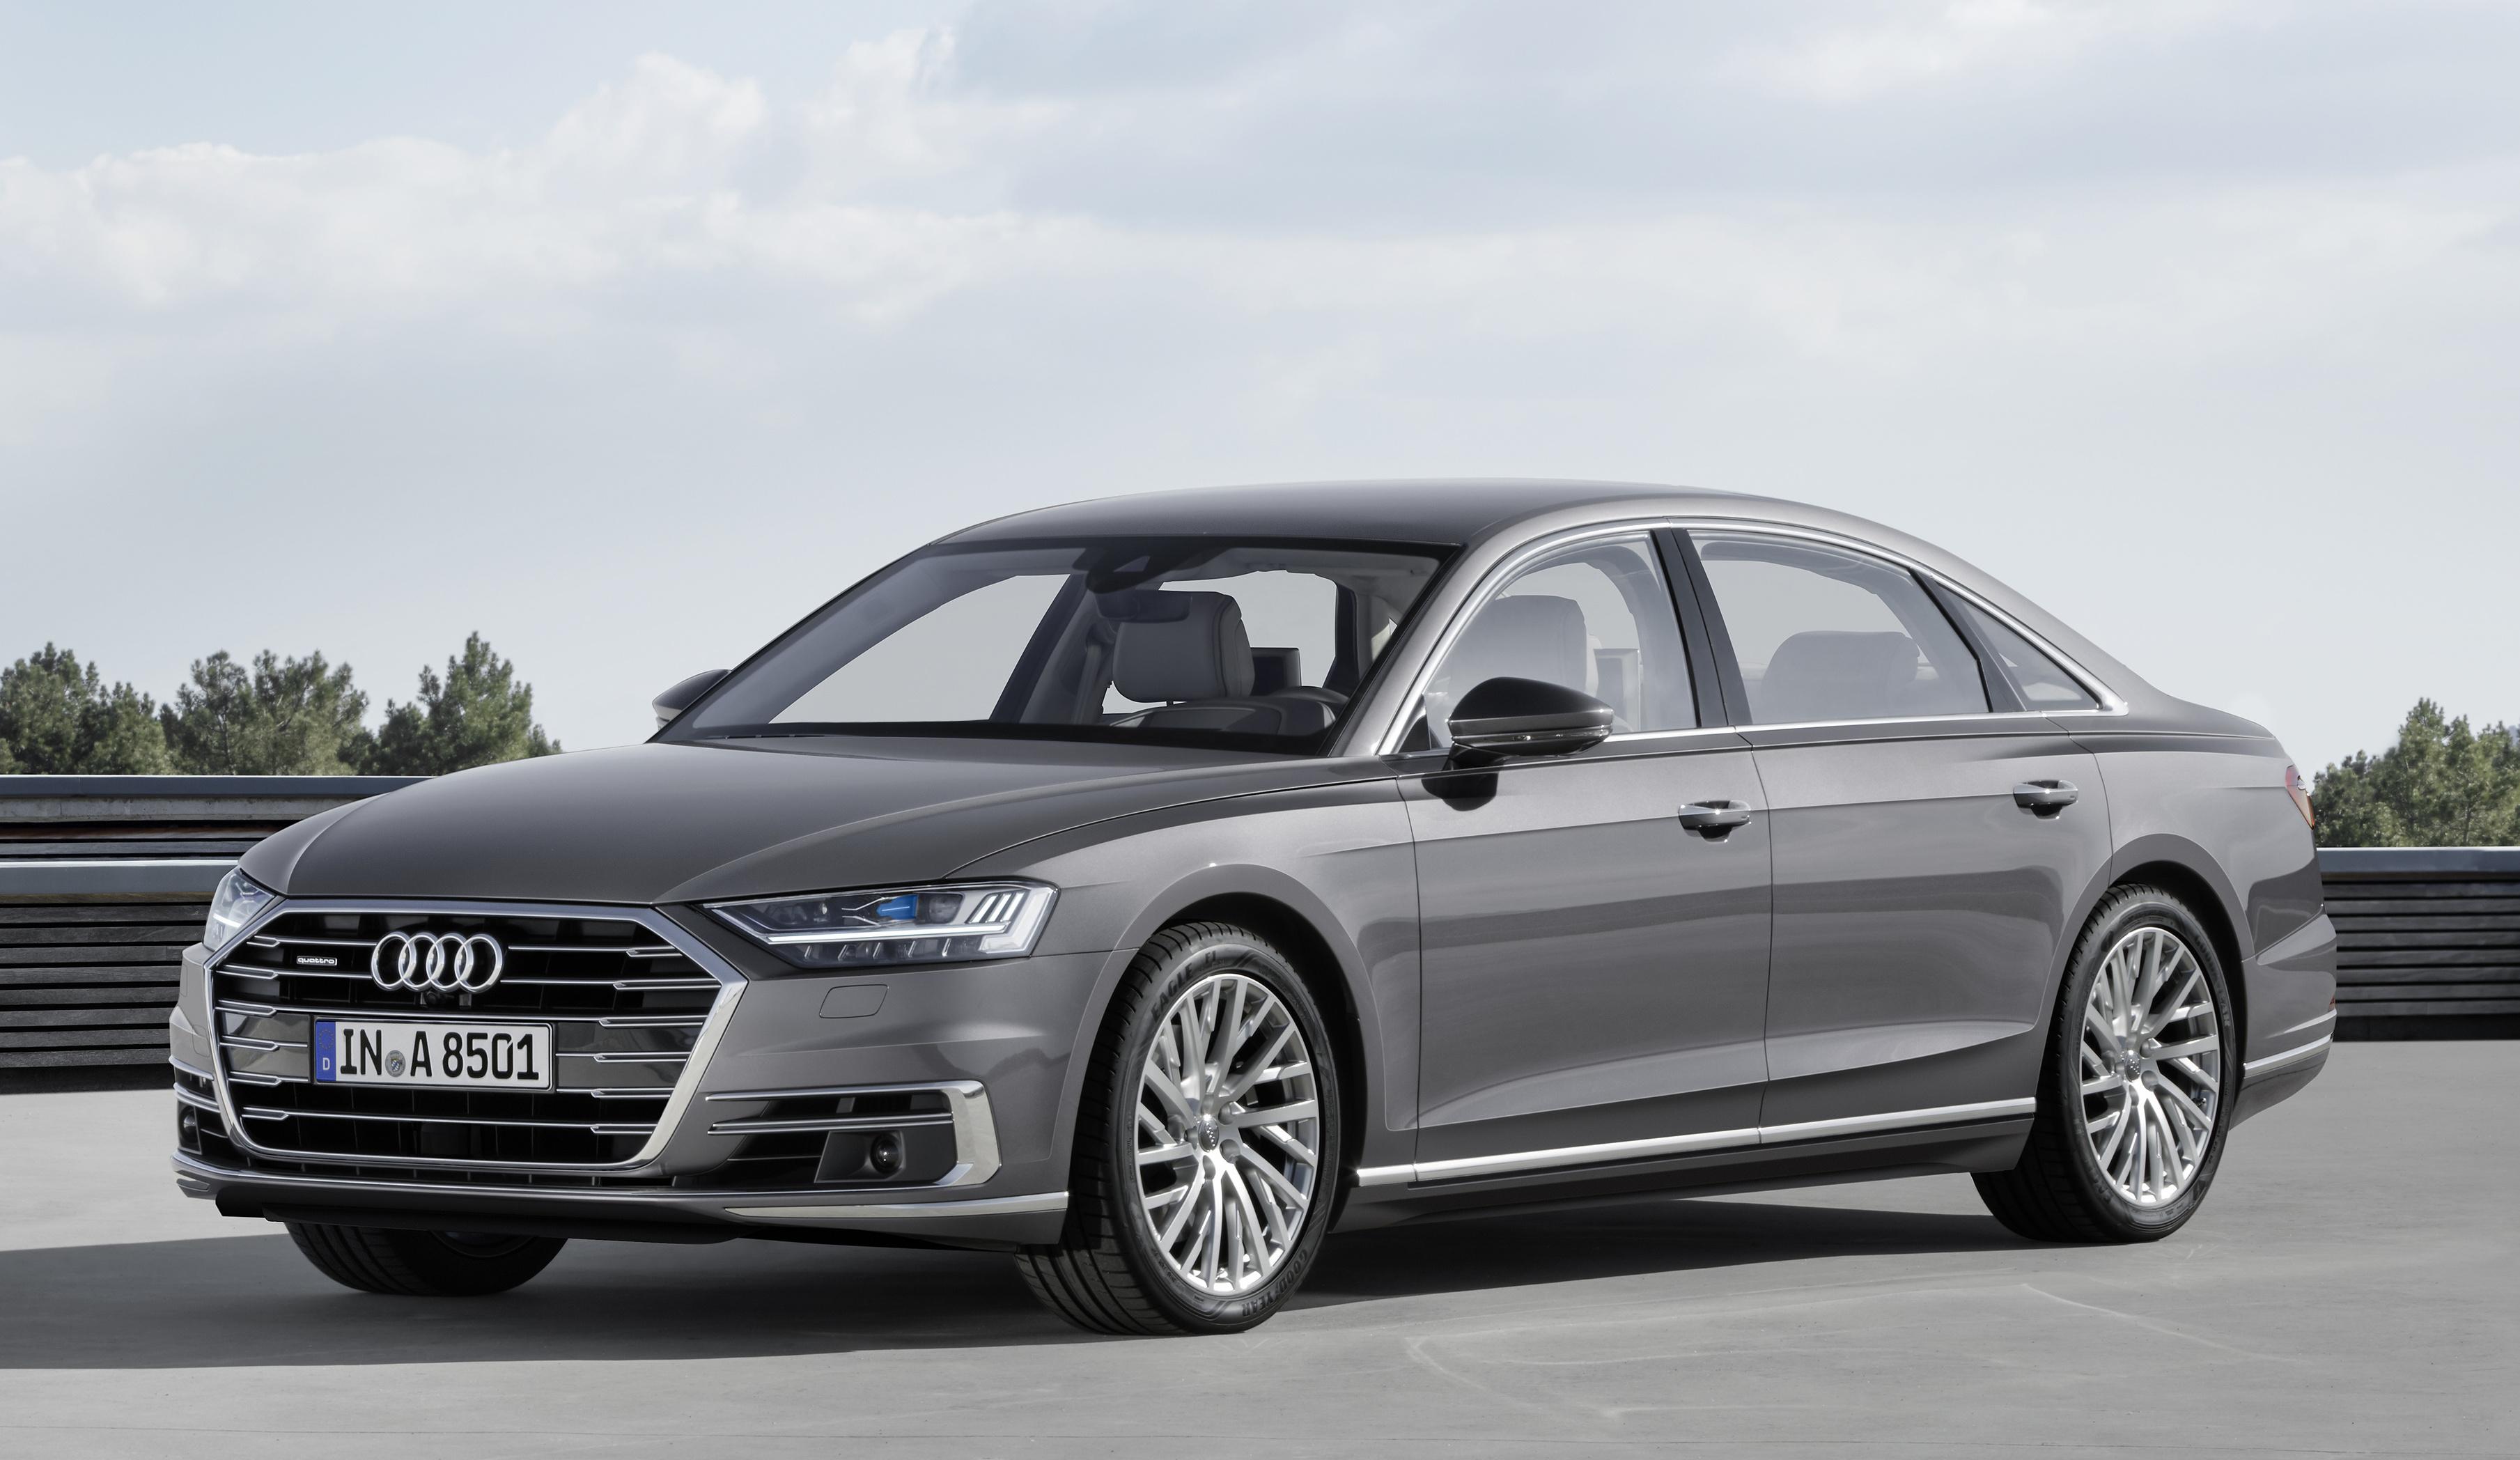 A 2018 Audi A8 sedan in silver.